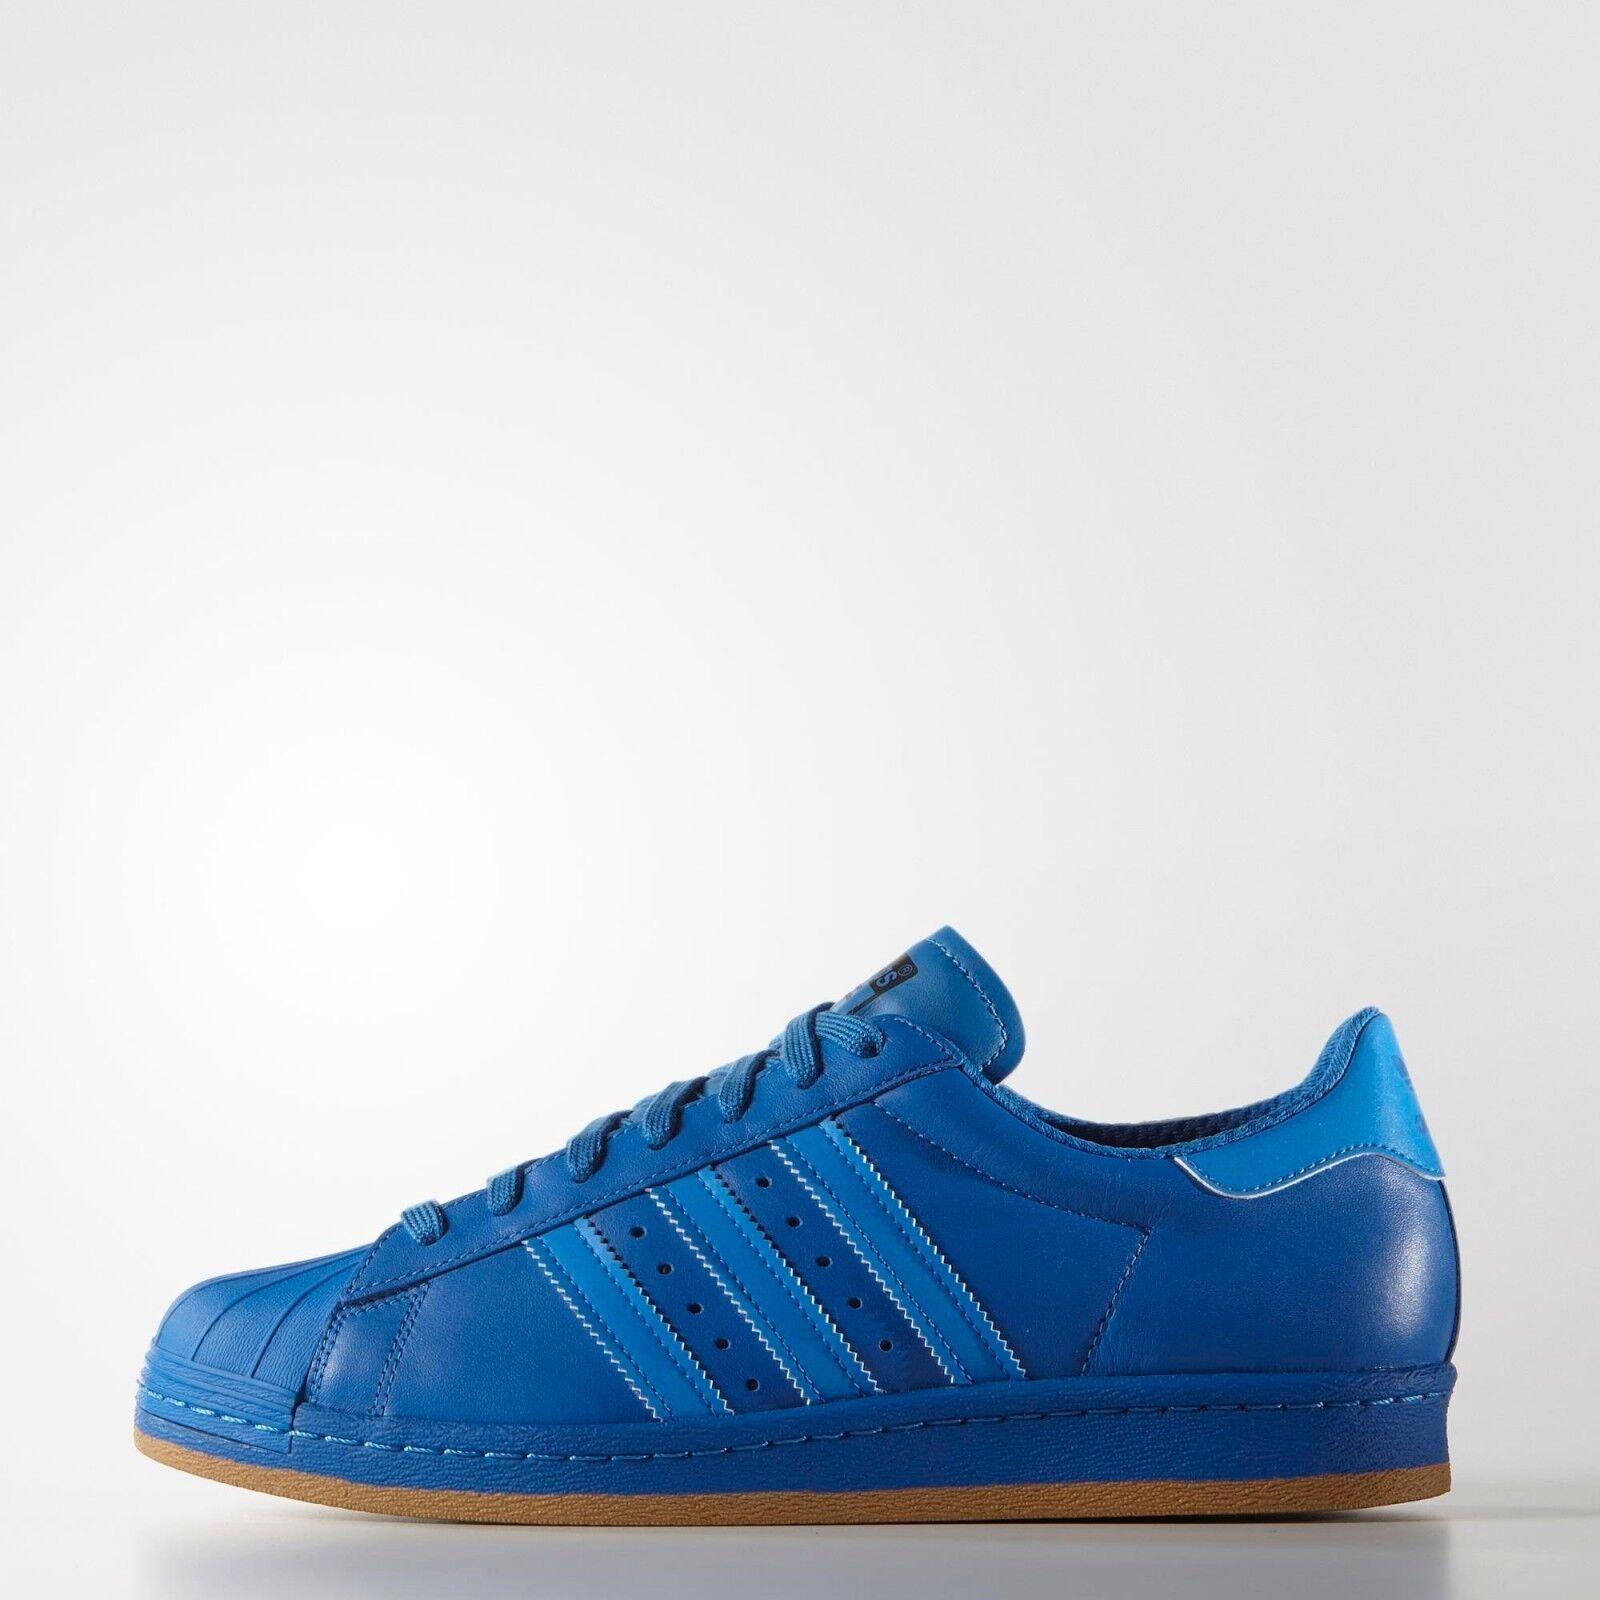 Adidas superstar años 80 Reflectante Nite Jogger azulbird Goma  Reino Unido 7.5